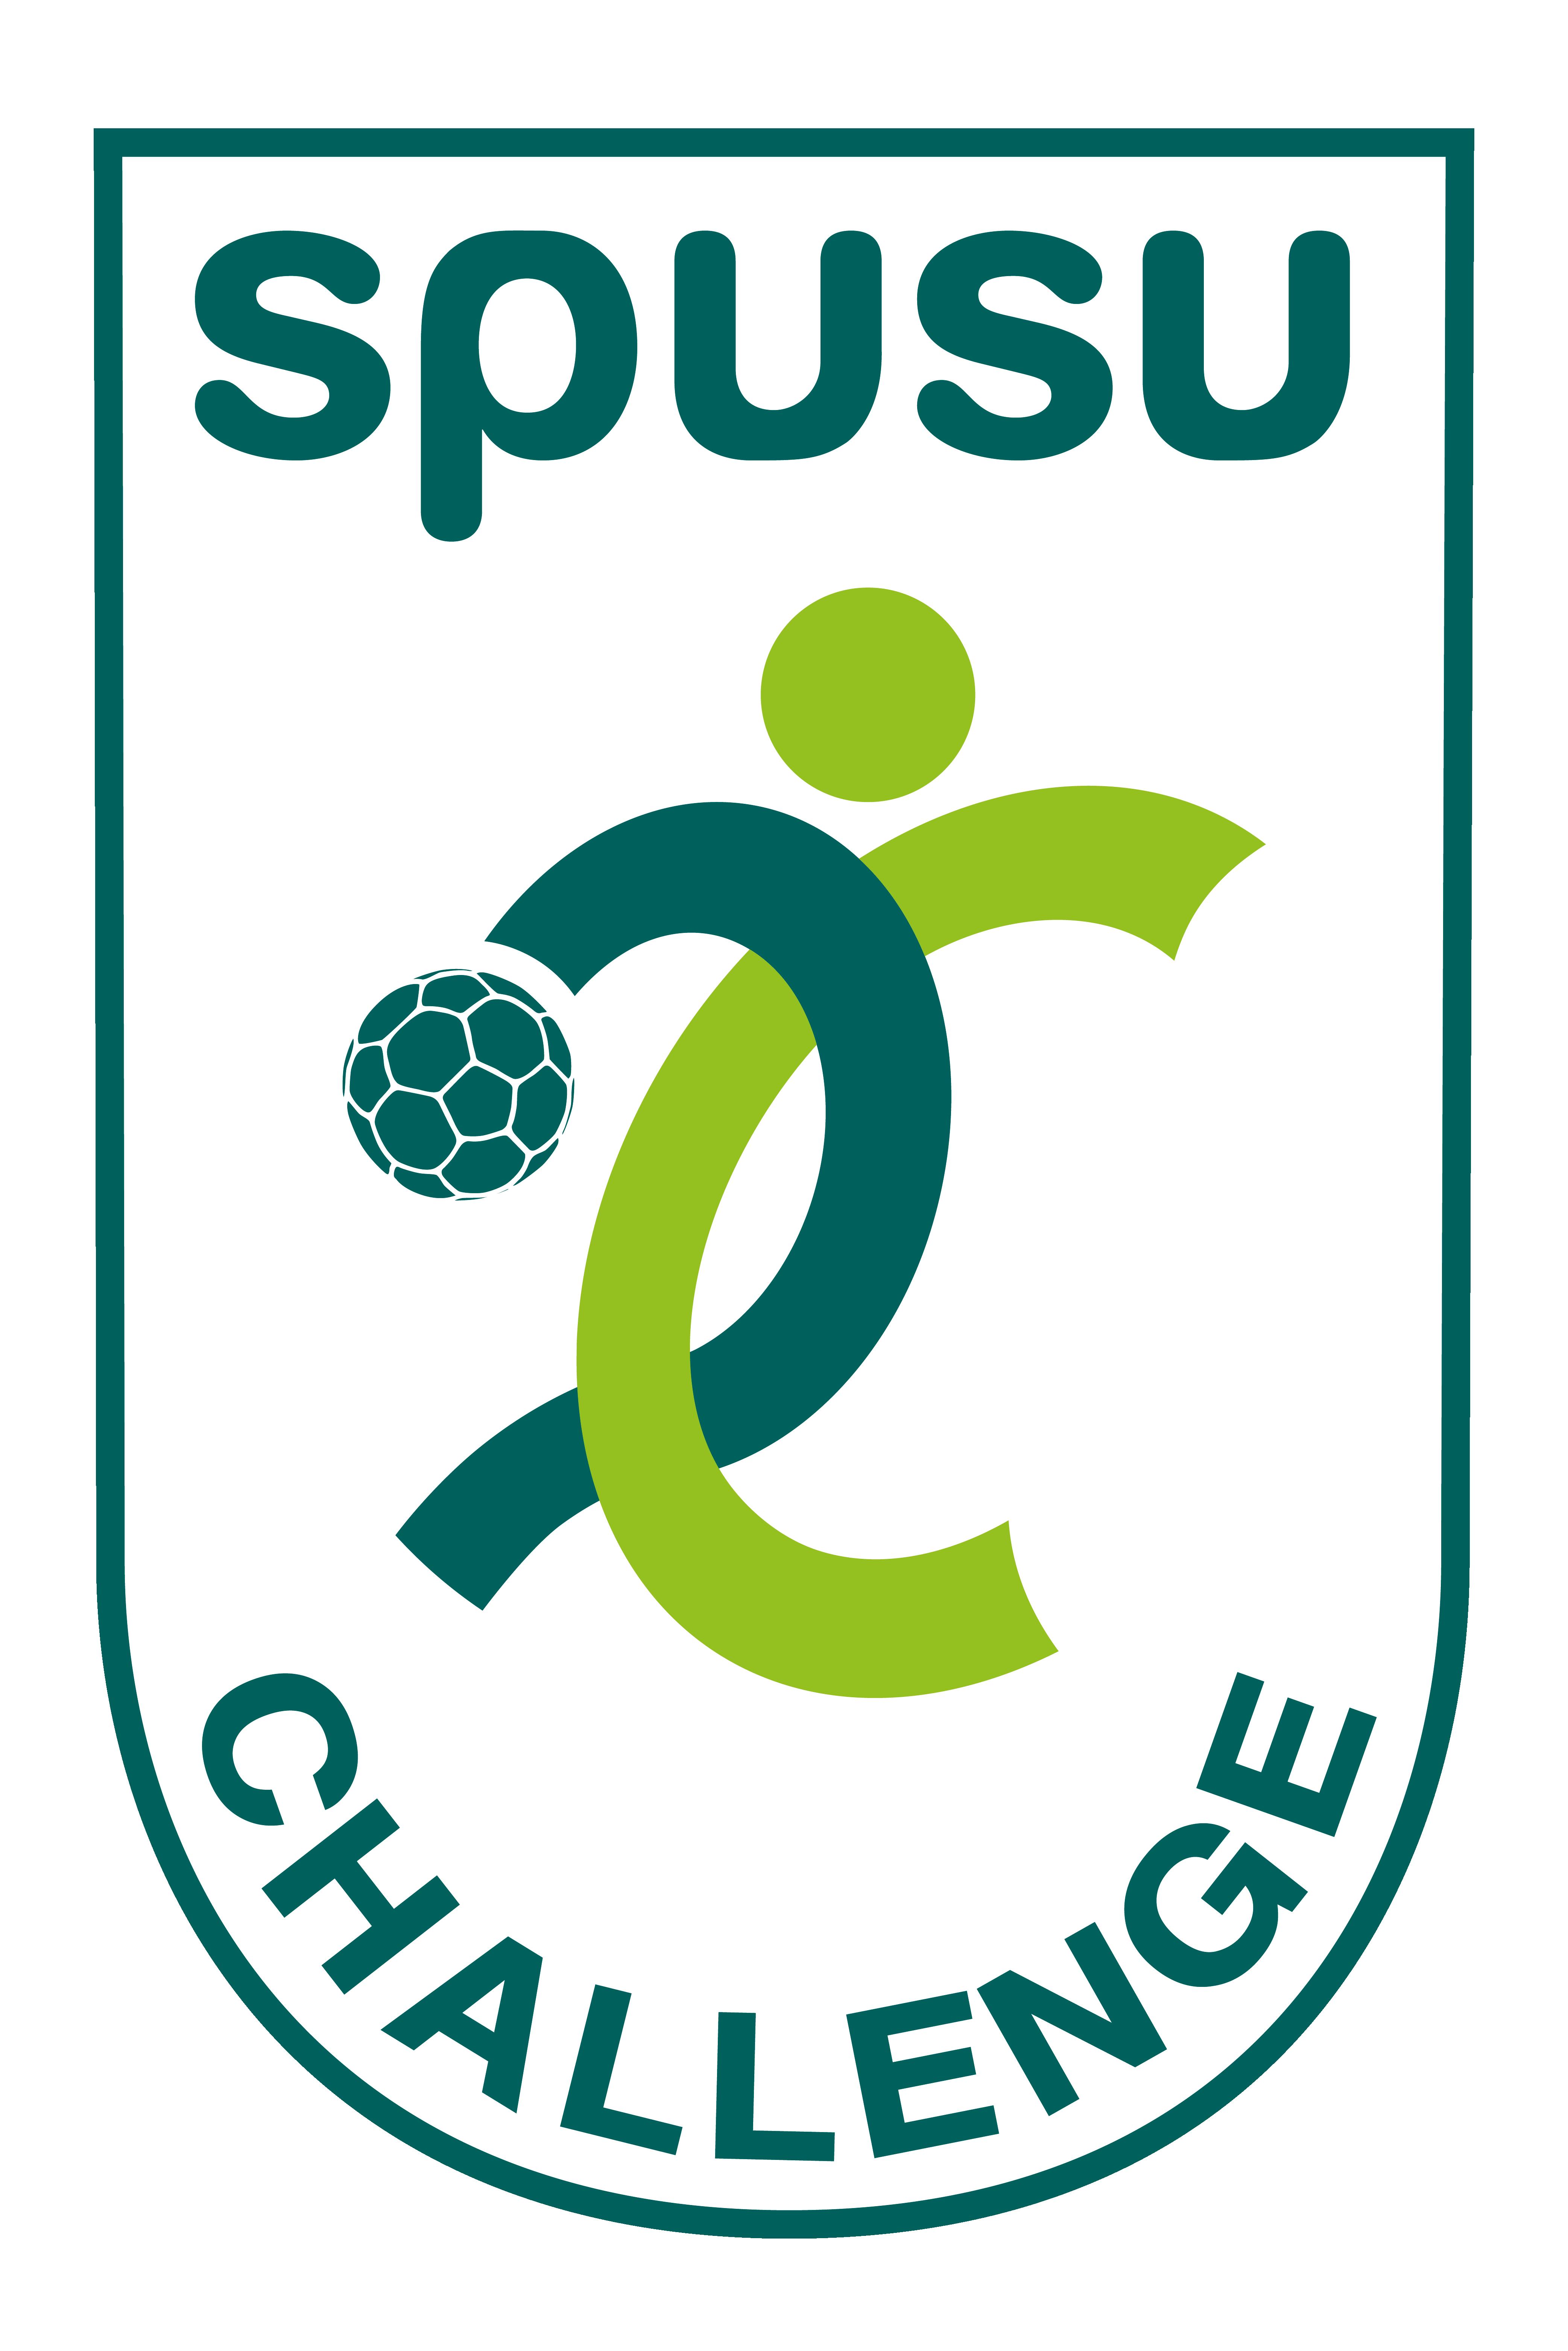 https://0501.nccdn.net/4_2/000/000/076/de9/spusu_challenge_logo_cmyk_colour.png